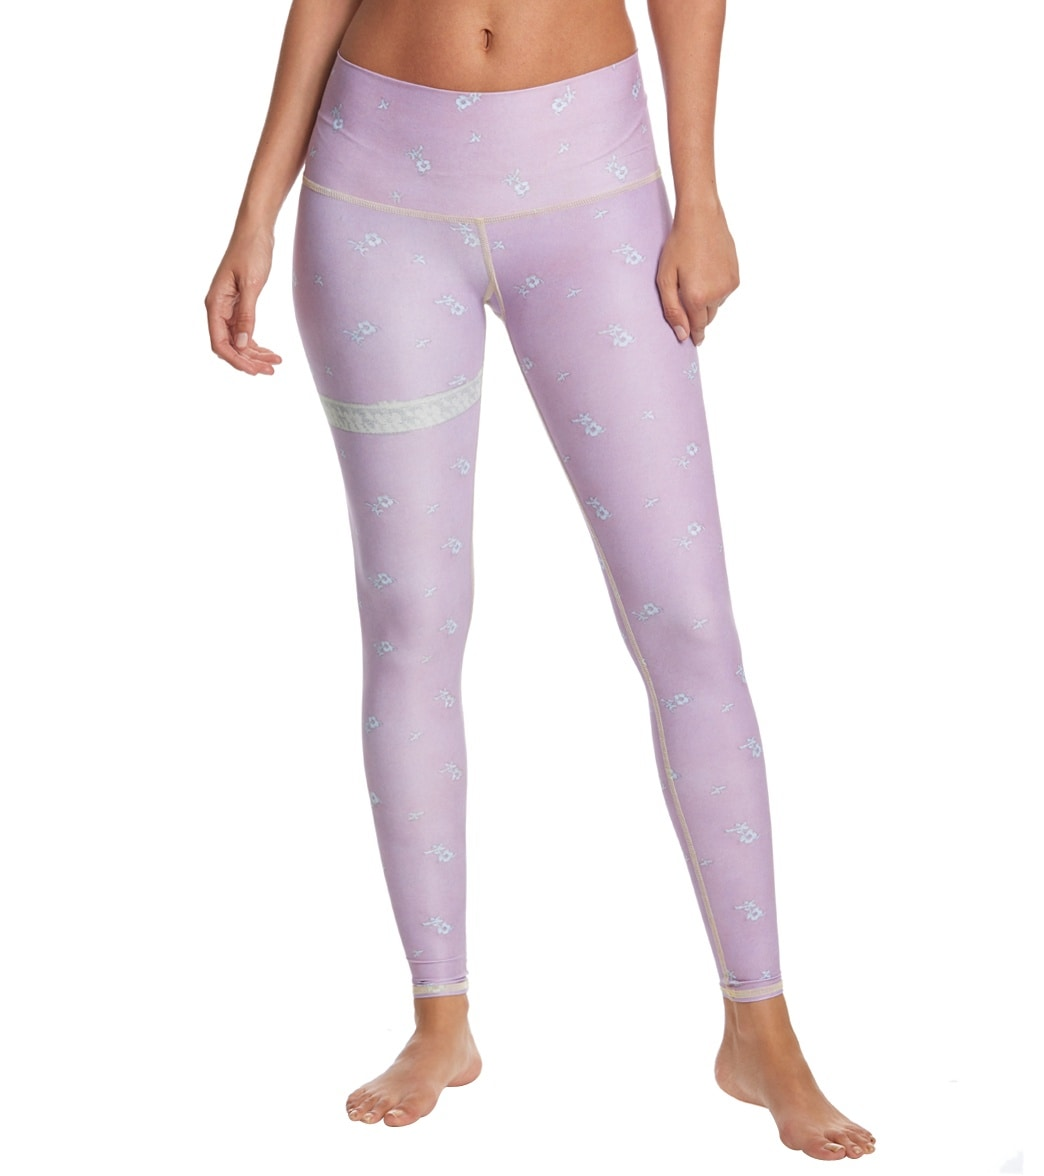 0b77285a9f Teeki Marry Me Purple Hot Yoga Pants at YogaOutlet.com - Free Shipping